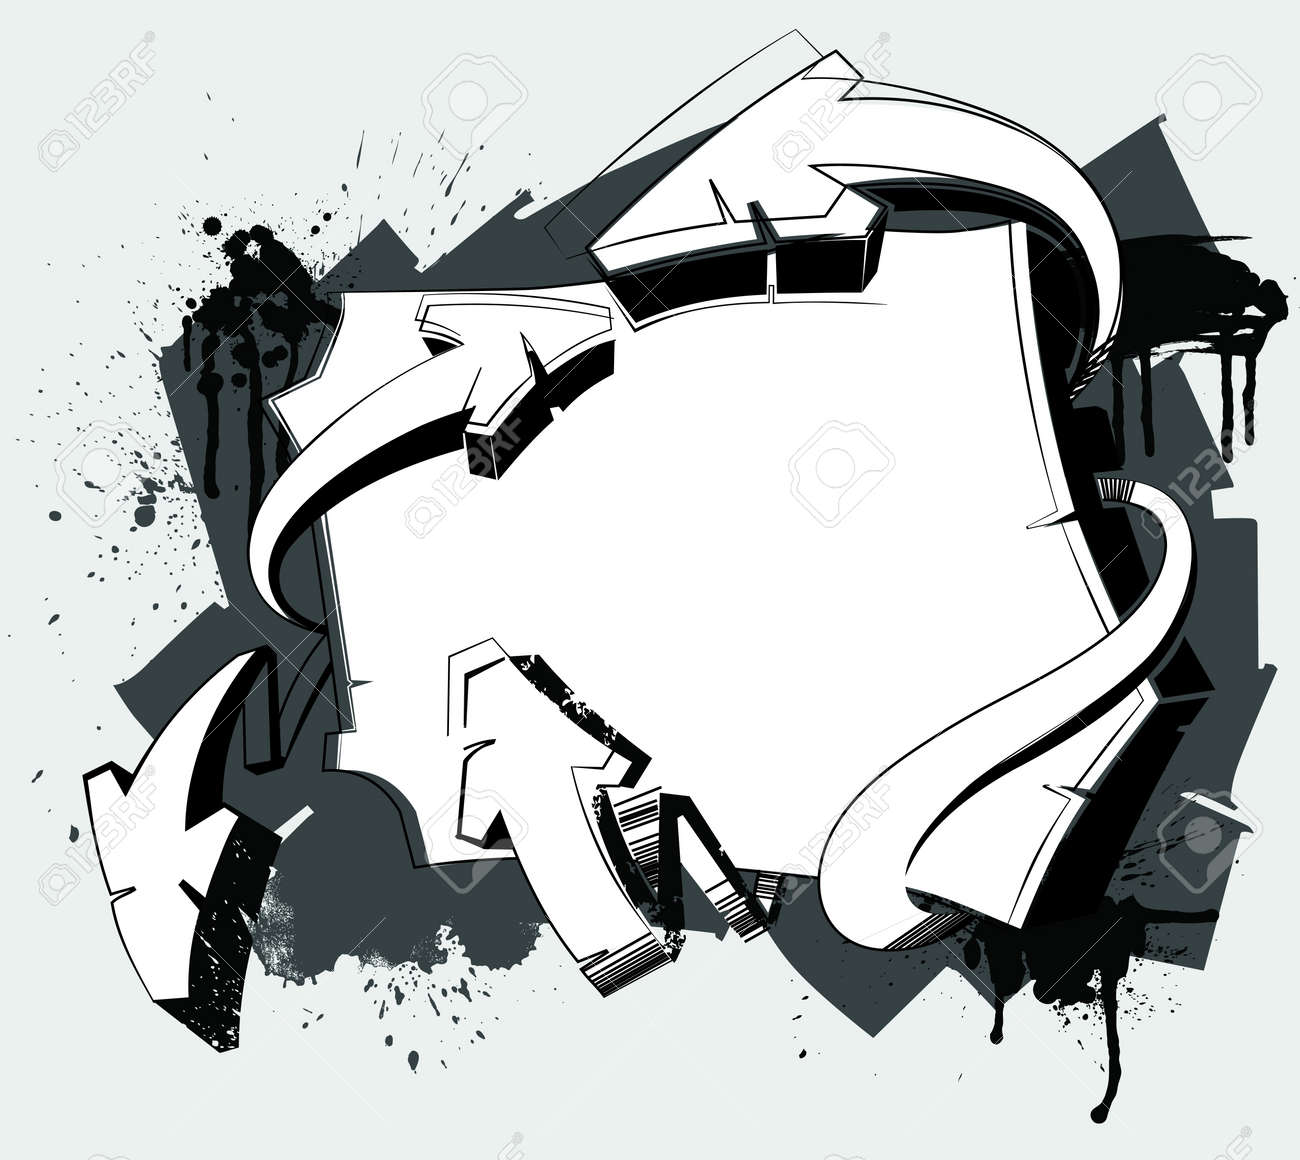 Graffiti art designs - Graffiti Background Abstract Background